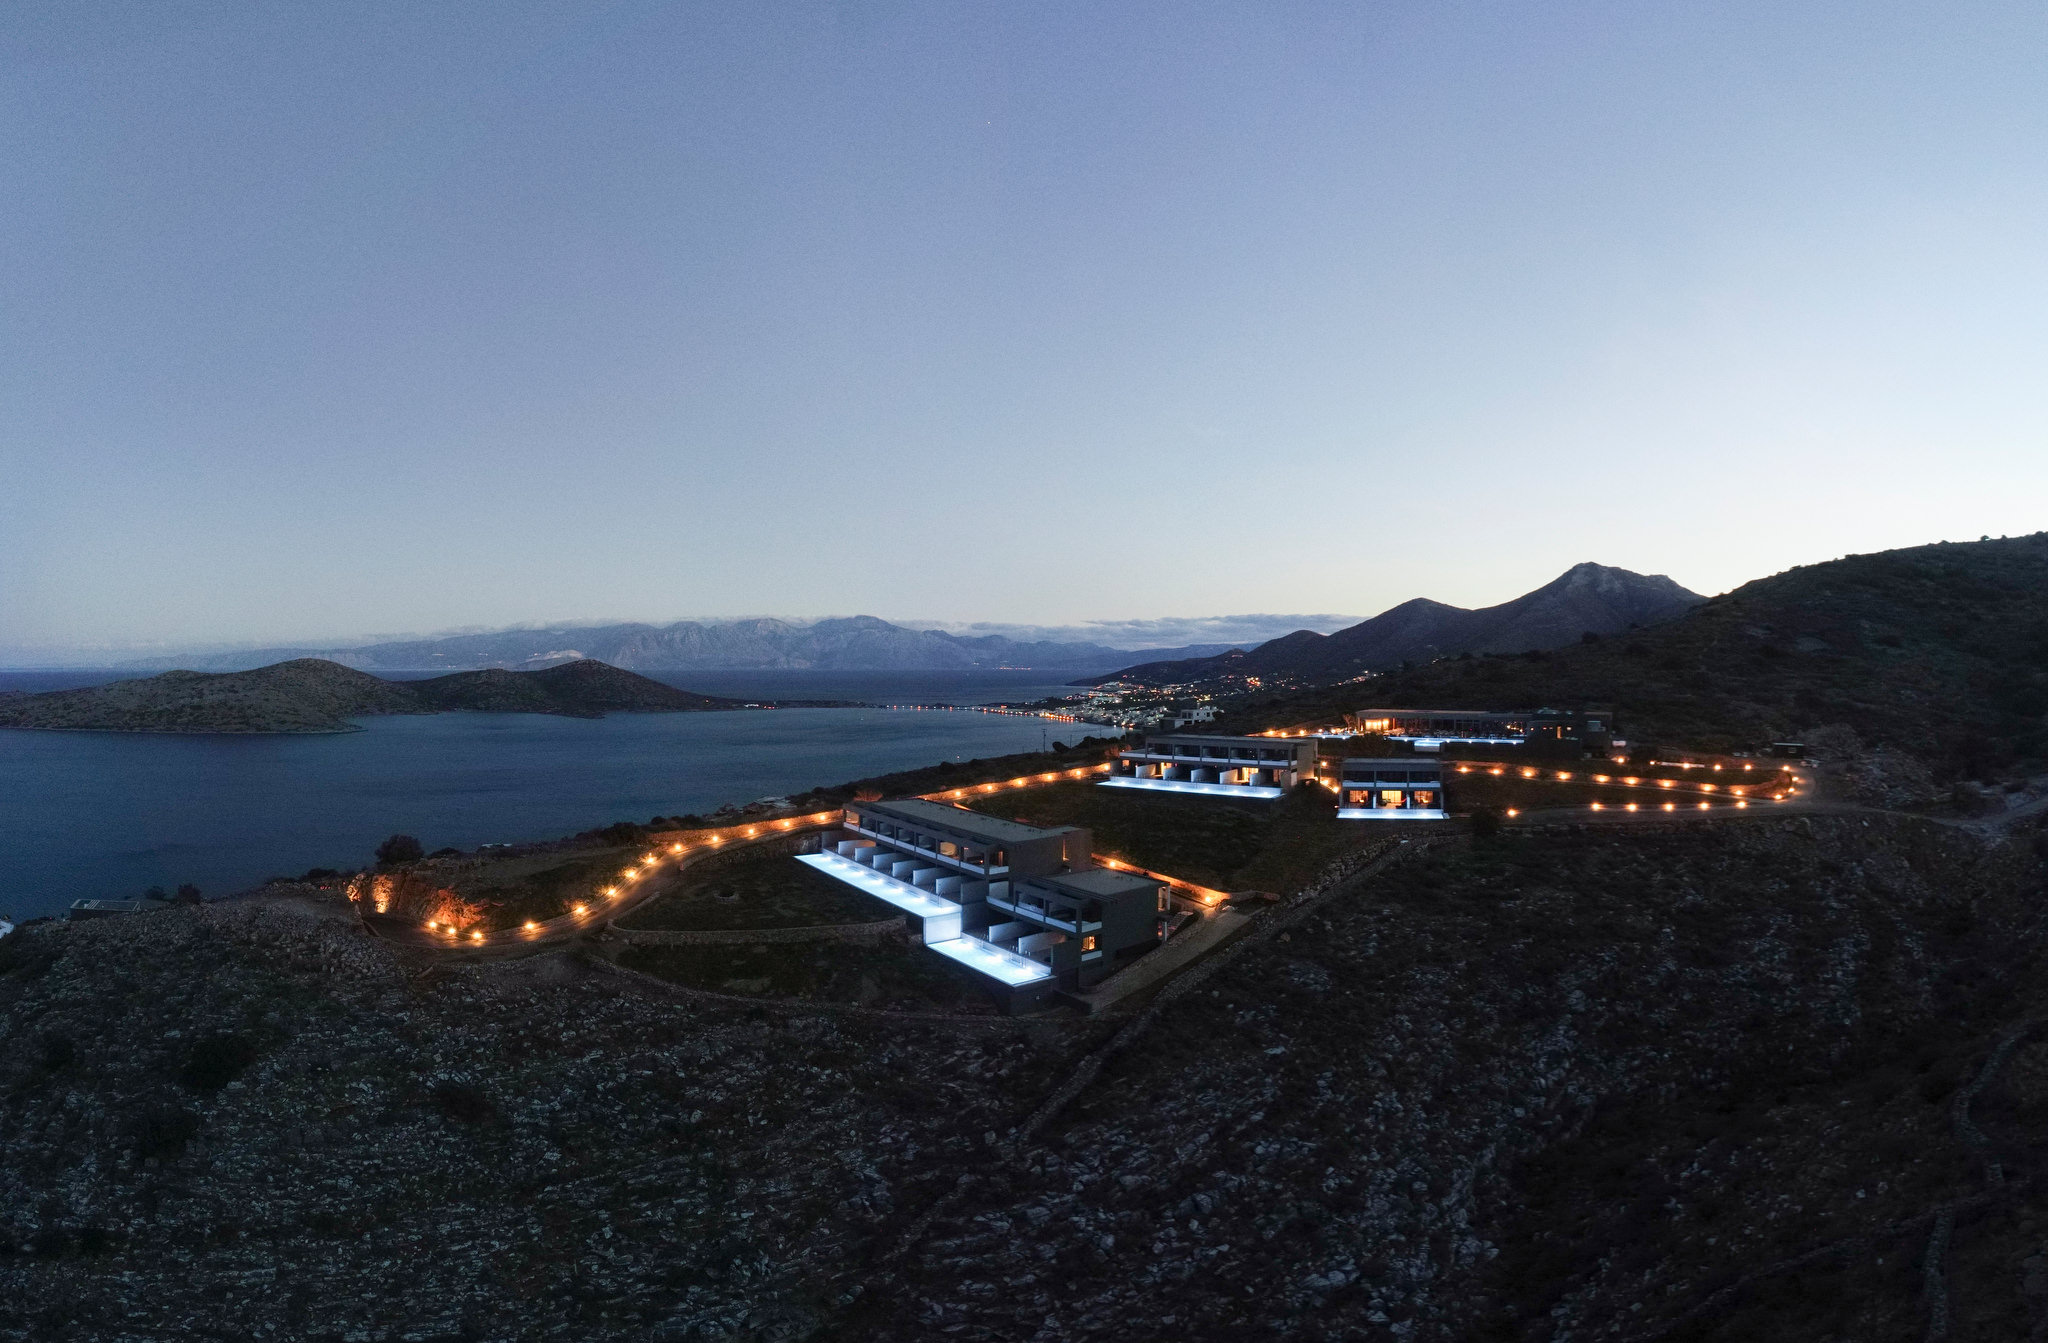 005_Panorama1.JPG